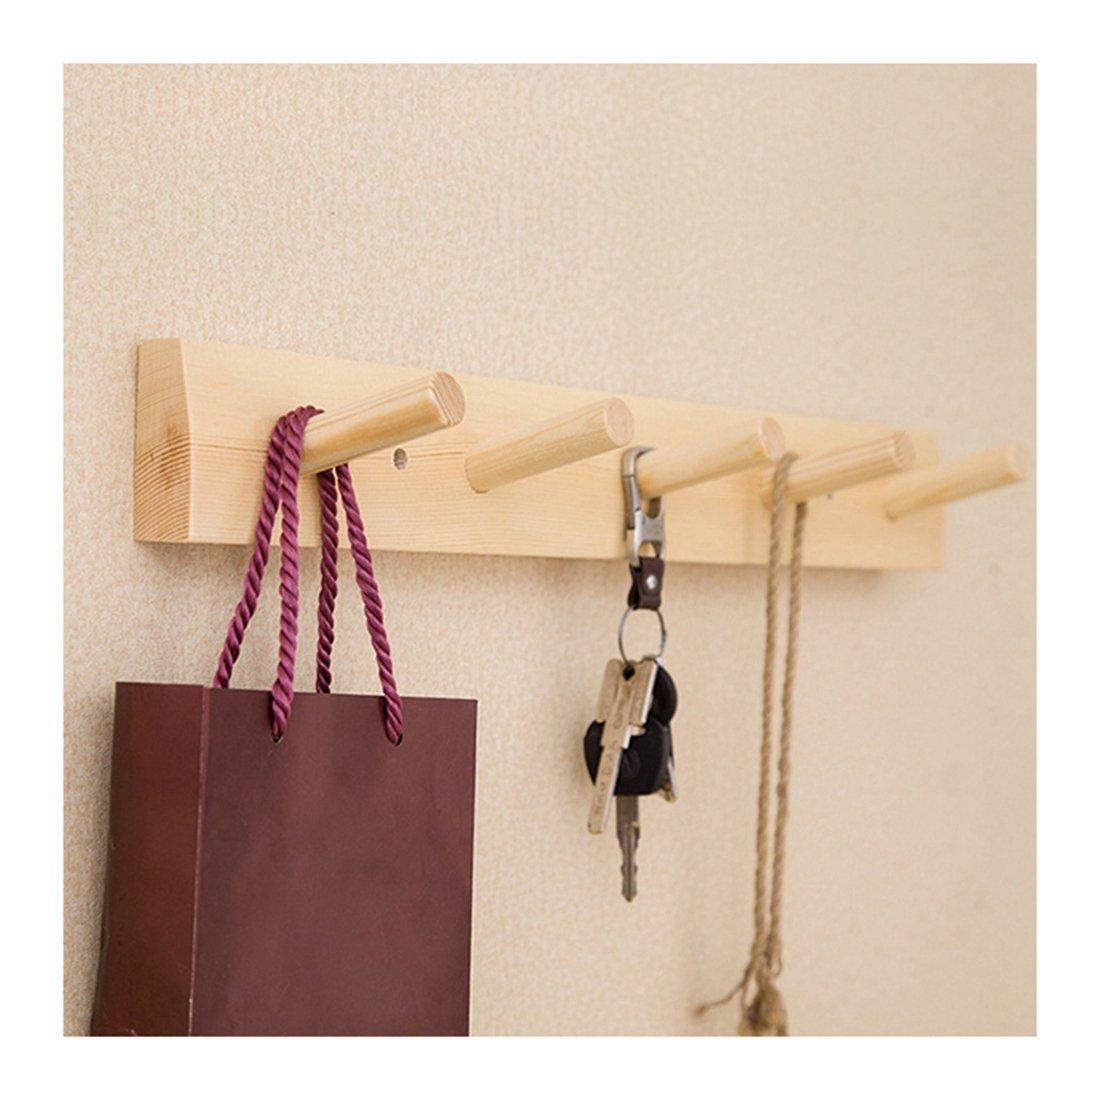 Jiyaru Wooden Coat Rail Rack Hook Wall Mounted Clothes Hanger Hat Holder Burlywood by Jiyaru (Image #1)